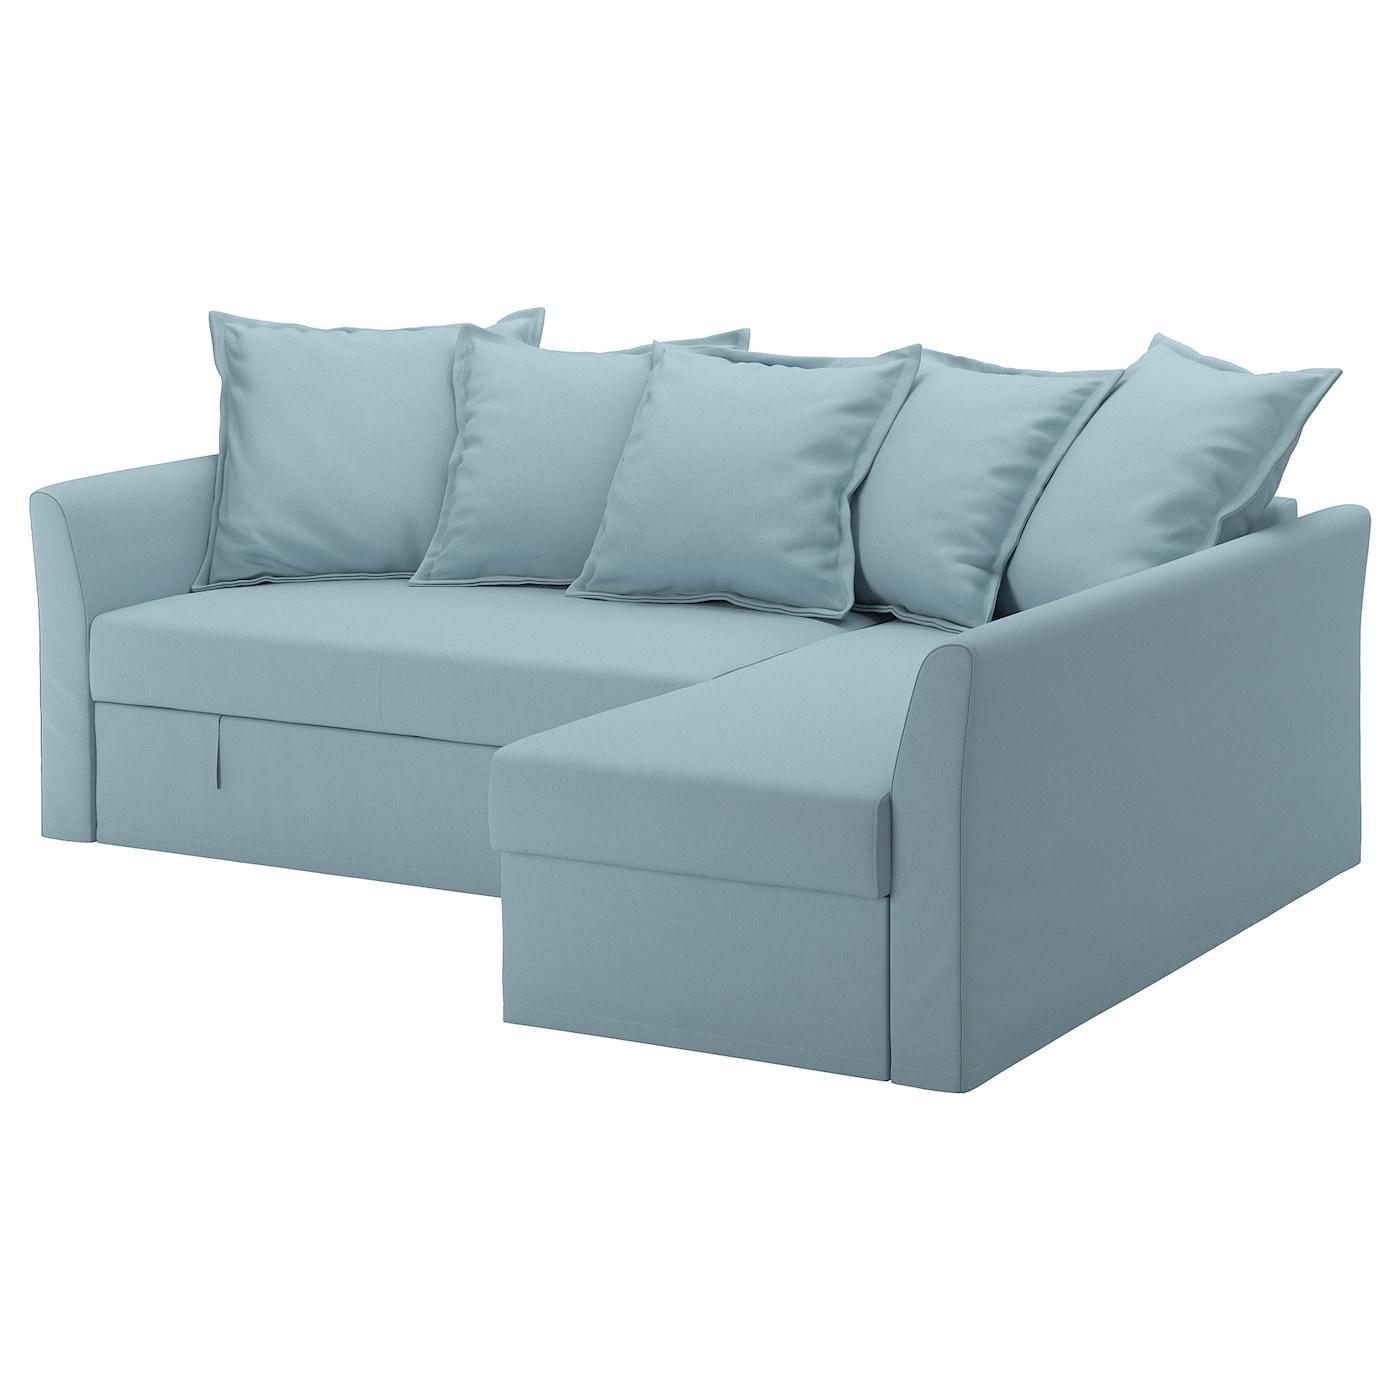 HOLMSUND Sleeper sectional, 3-seat - Orrsta light blue - IKEA